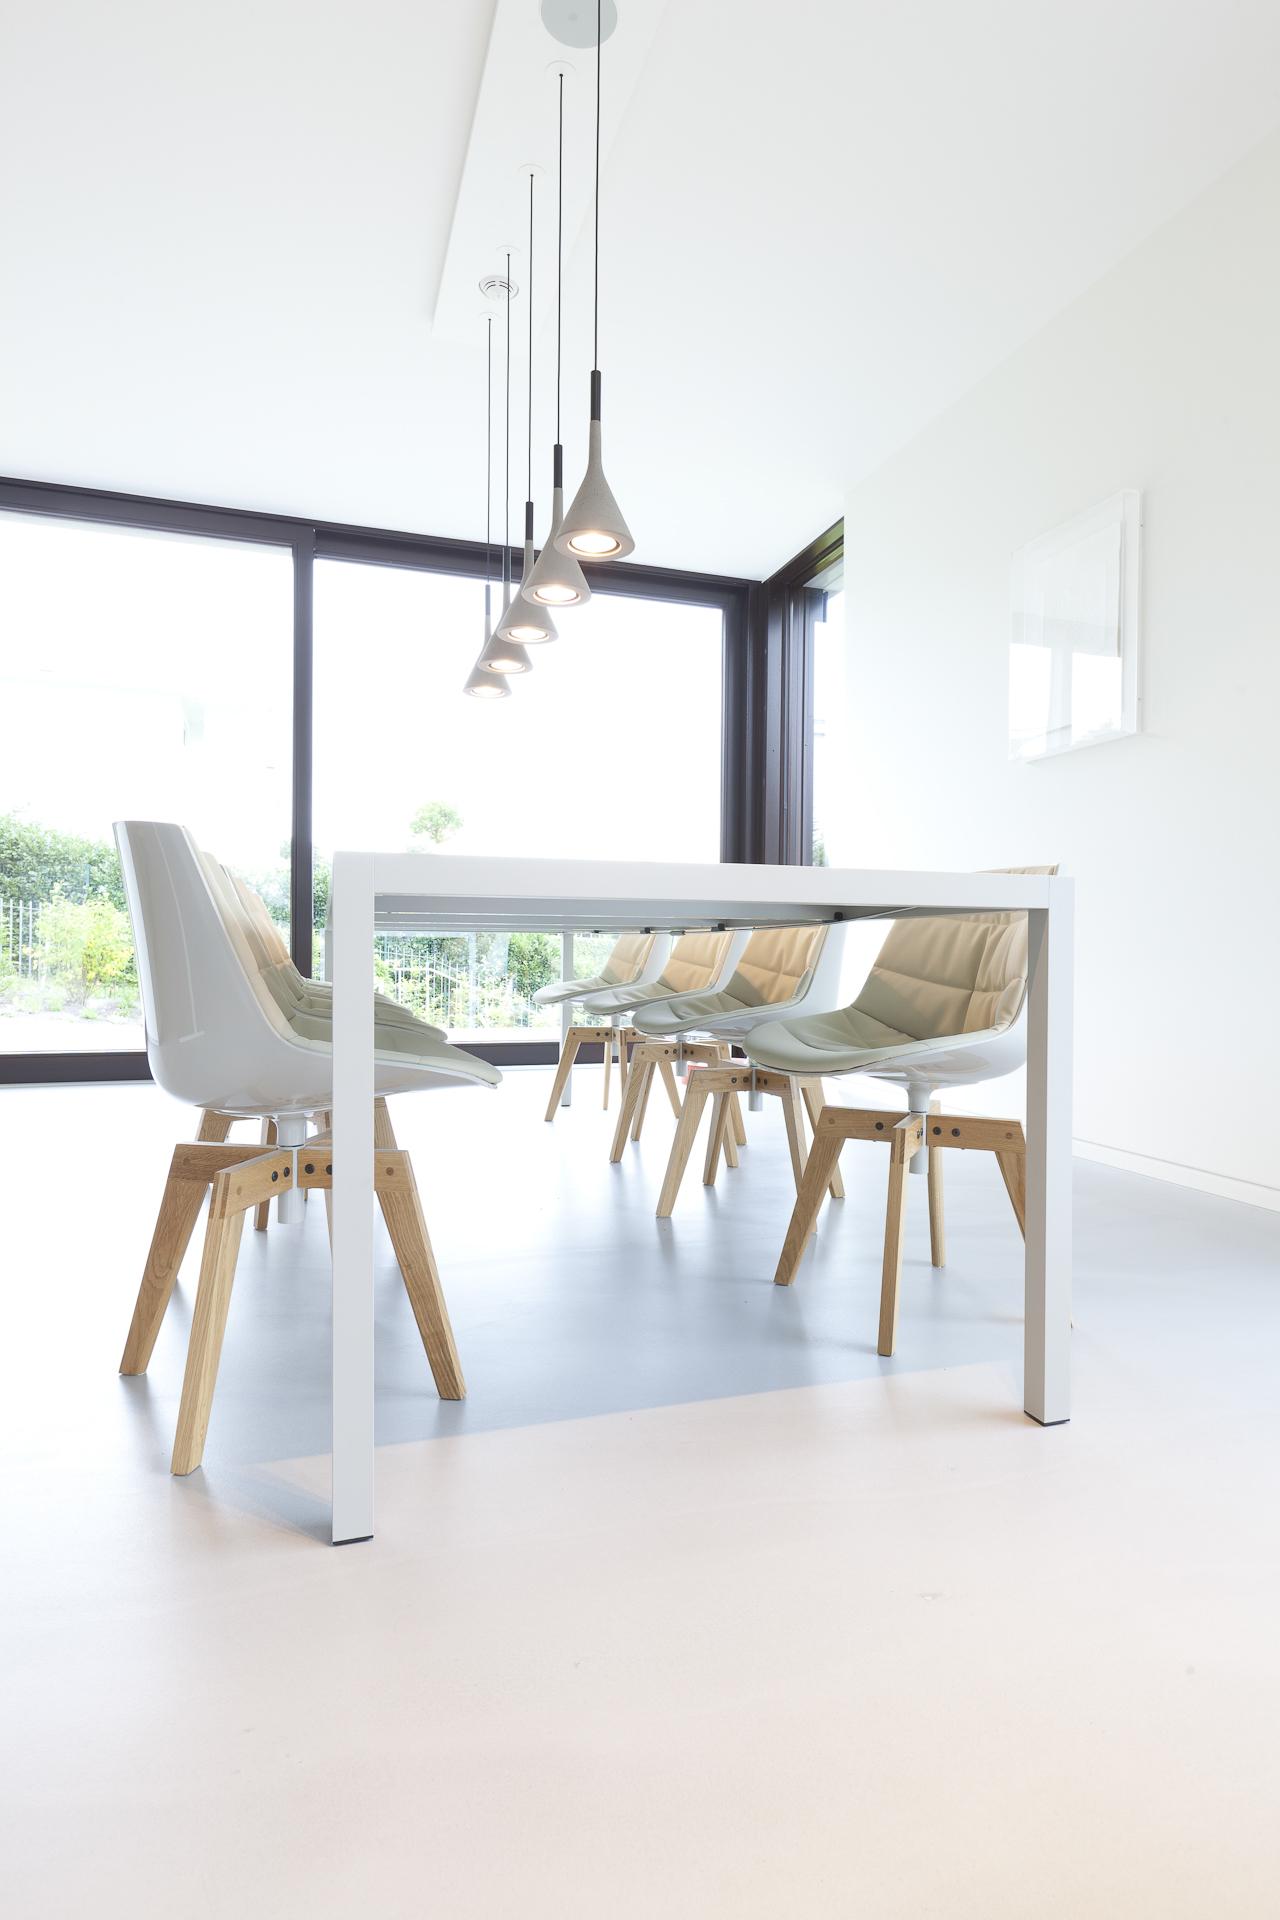 Peter_Leenders_Fotografie_Wrede_Architekten-12